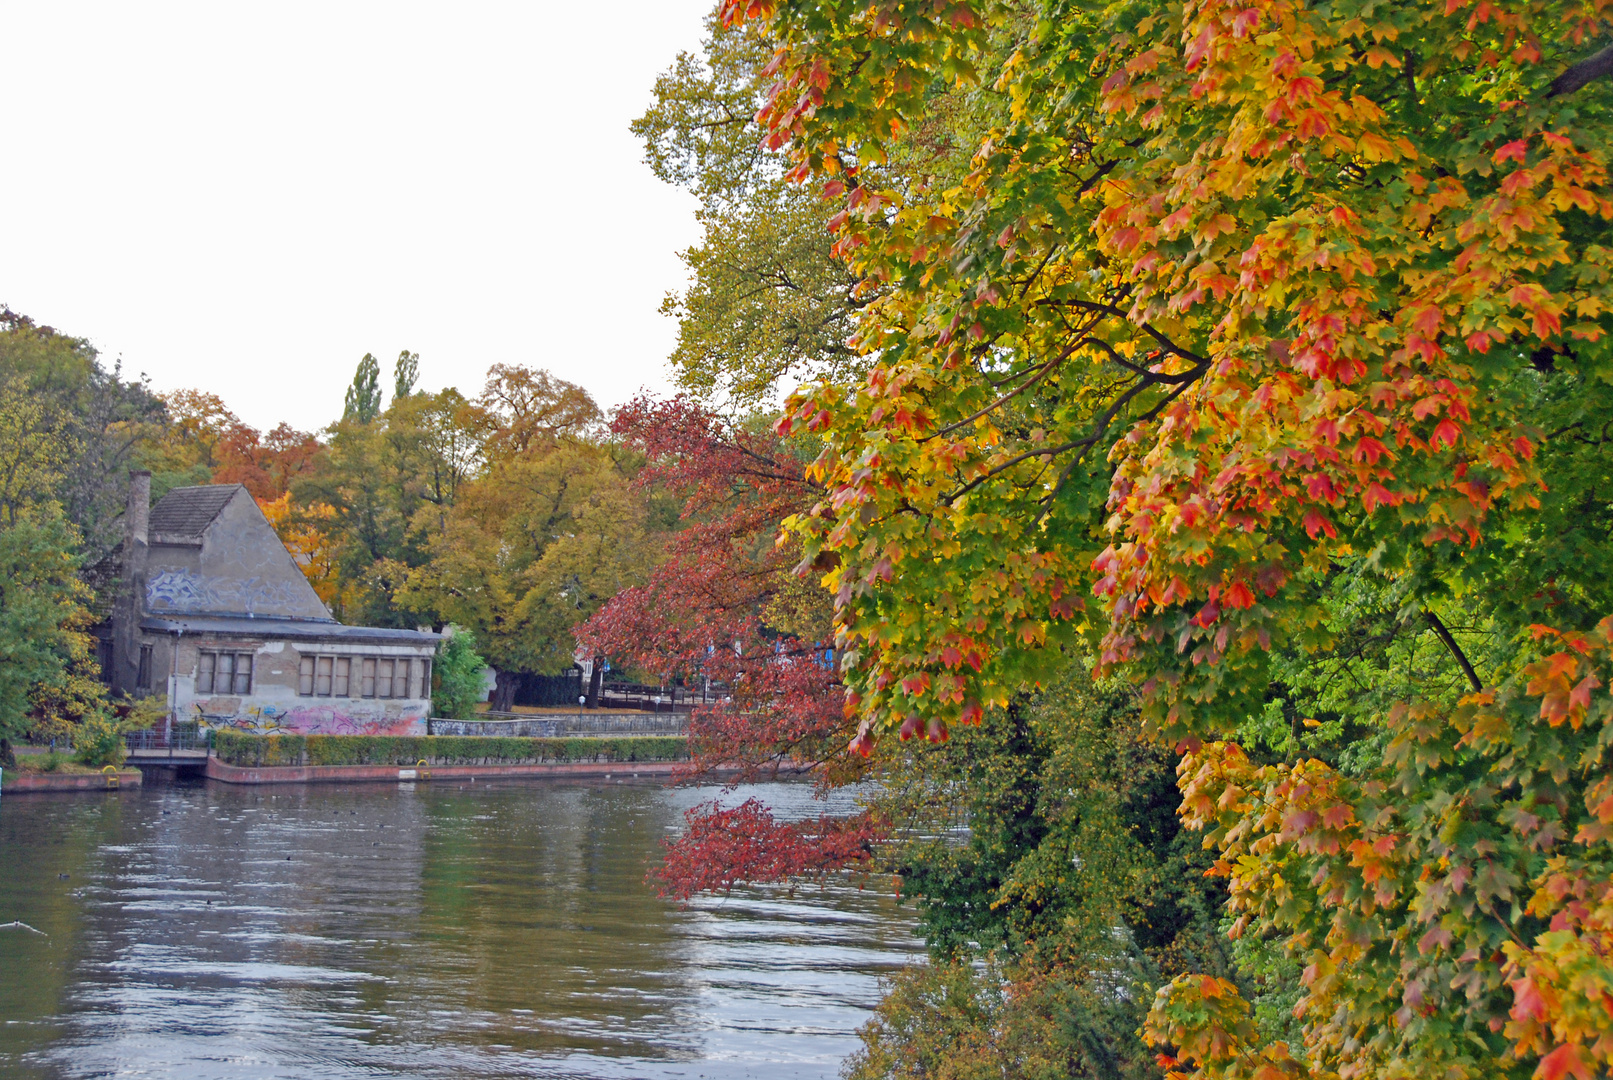 bunter Herbst an der Spree